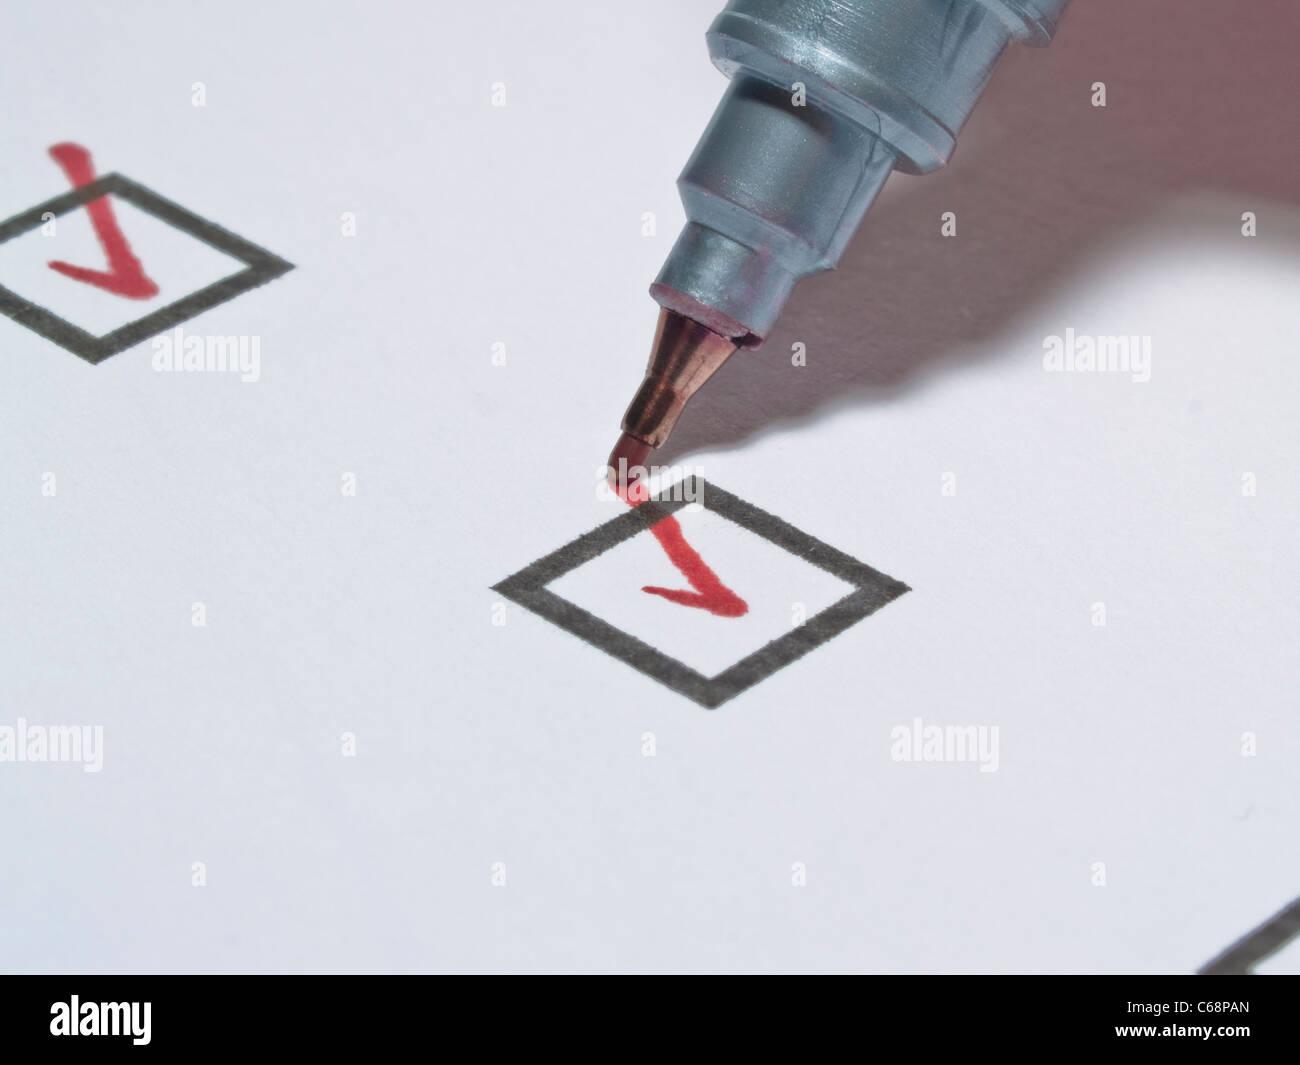 ein roter Stift hakt eine Kästchen in einer Liste ab   a red pin makes a check in a small box in a list Stock Photo